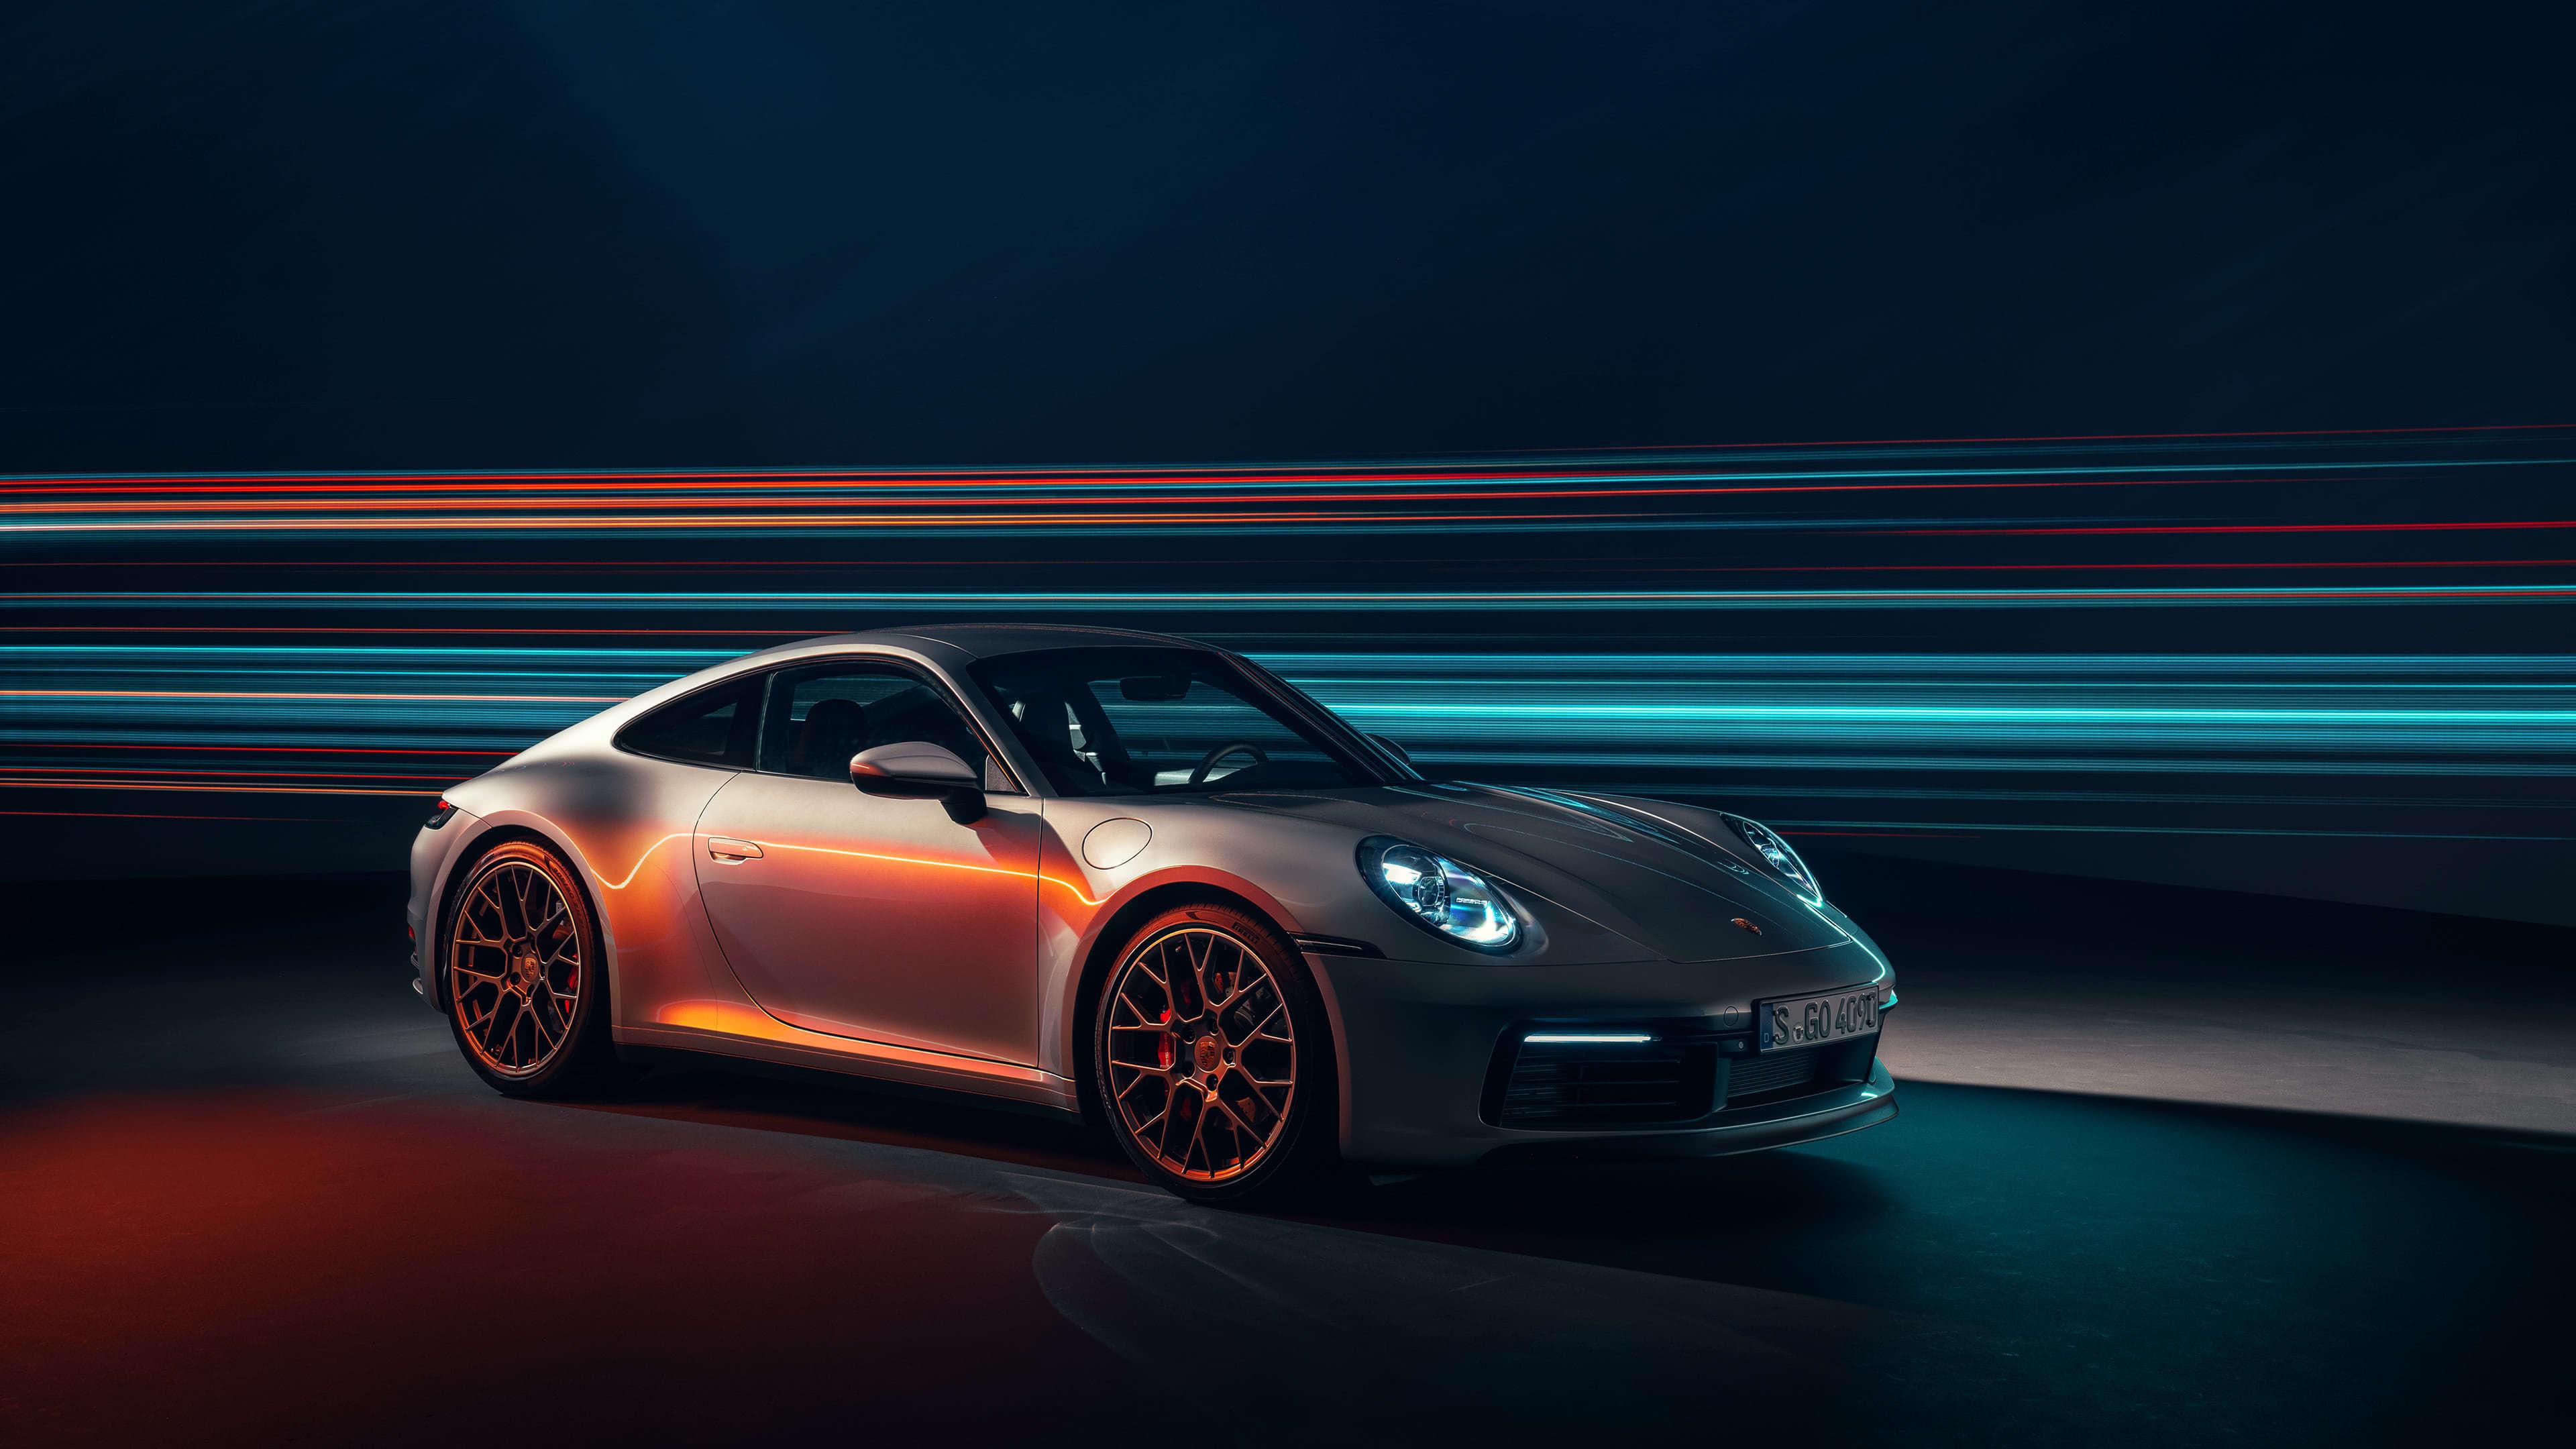 Porsche 911 Carrera 4S UHD 4K Wallpaper Pixelz 3840x2160